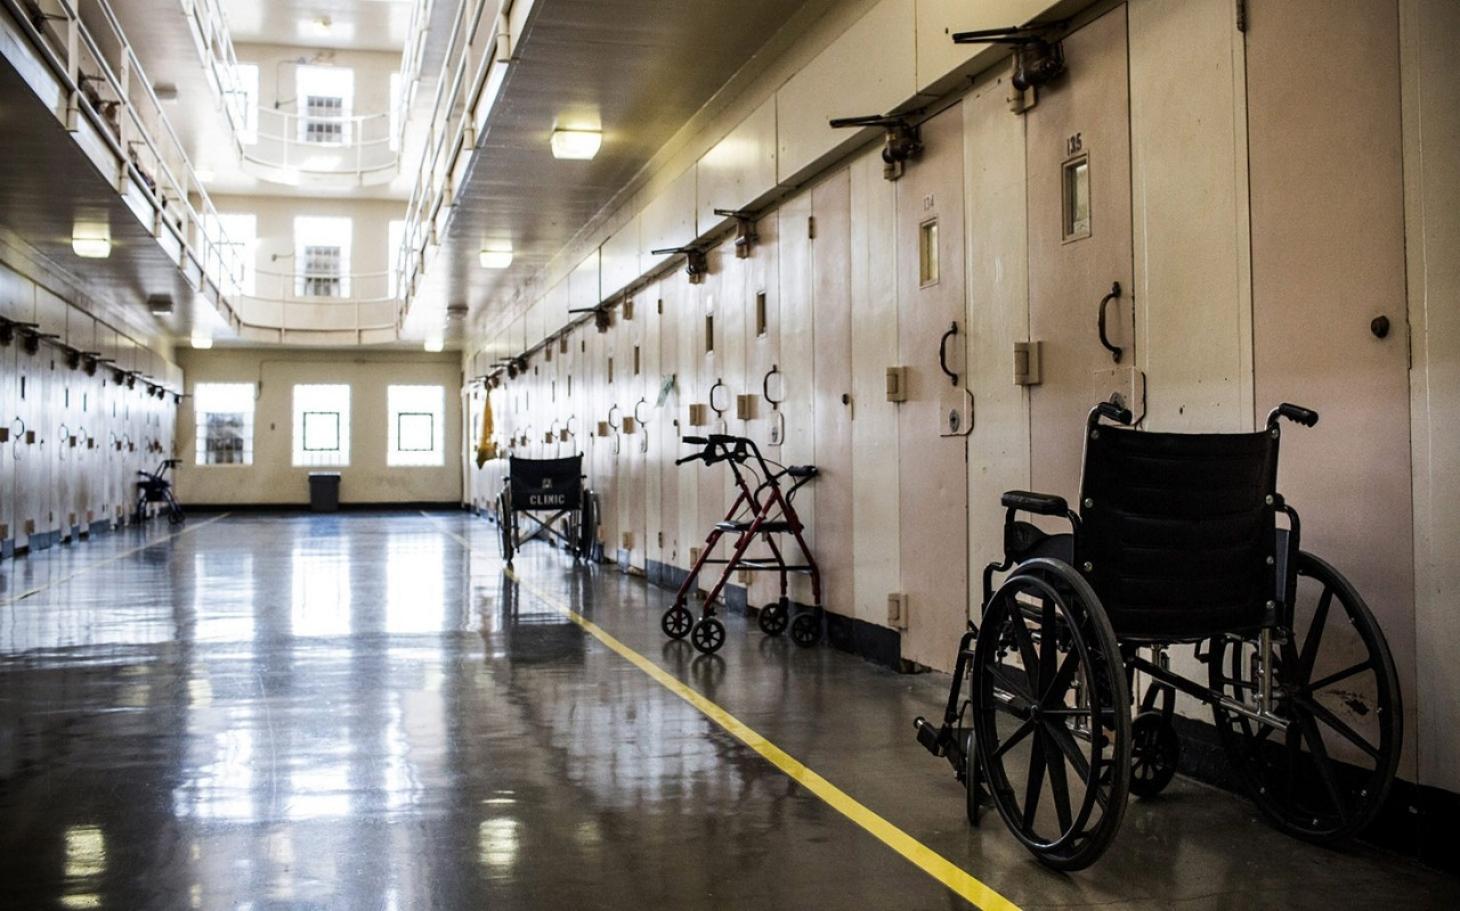 Abolish the death penalty essay